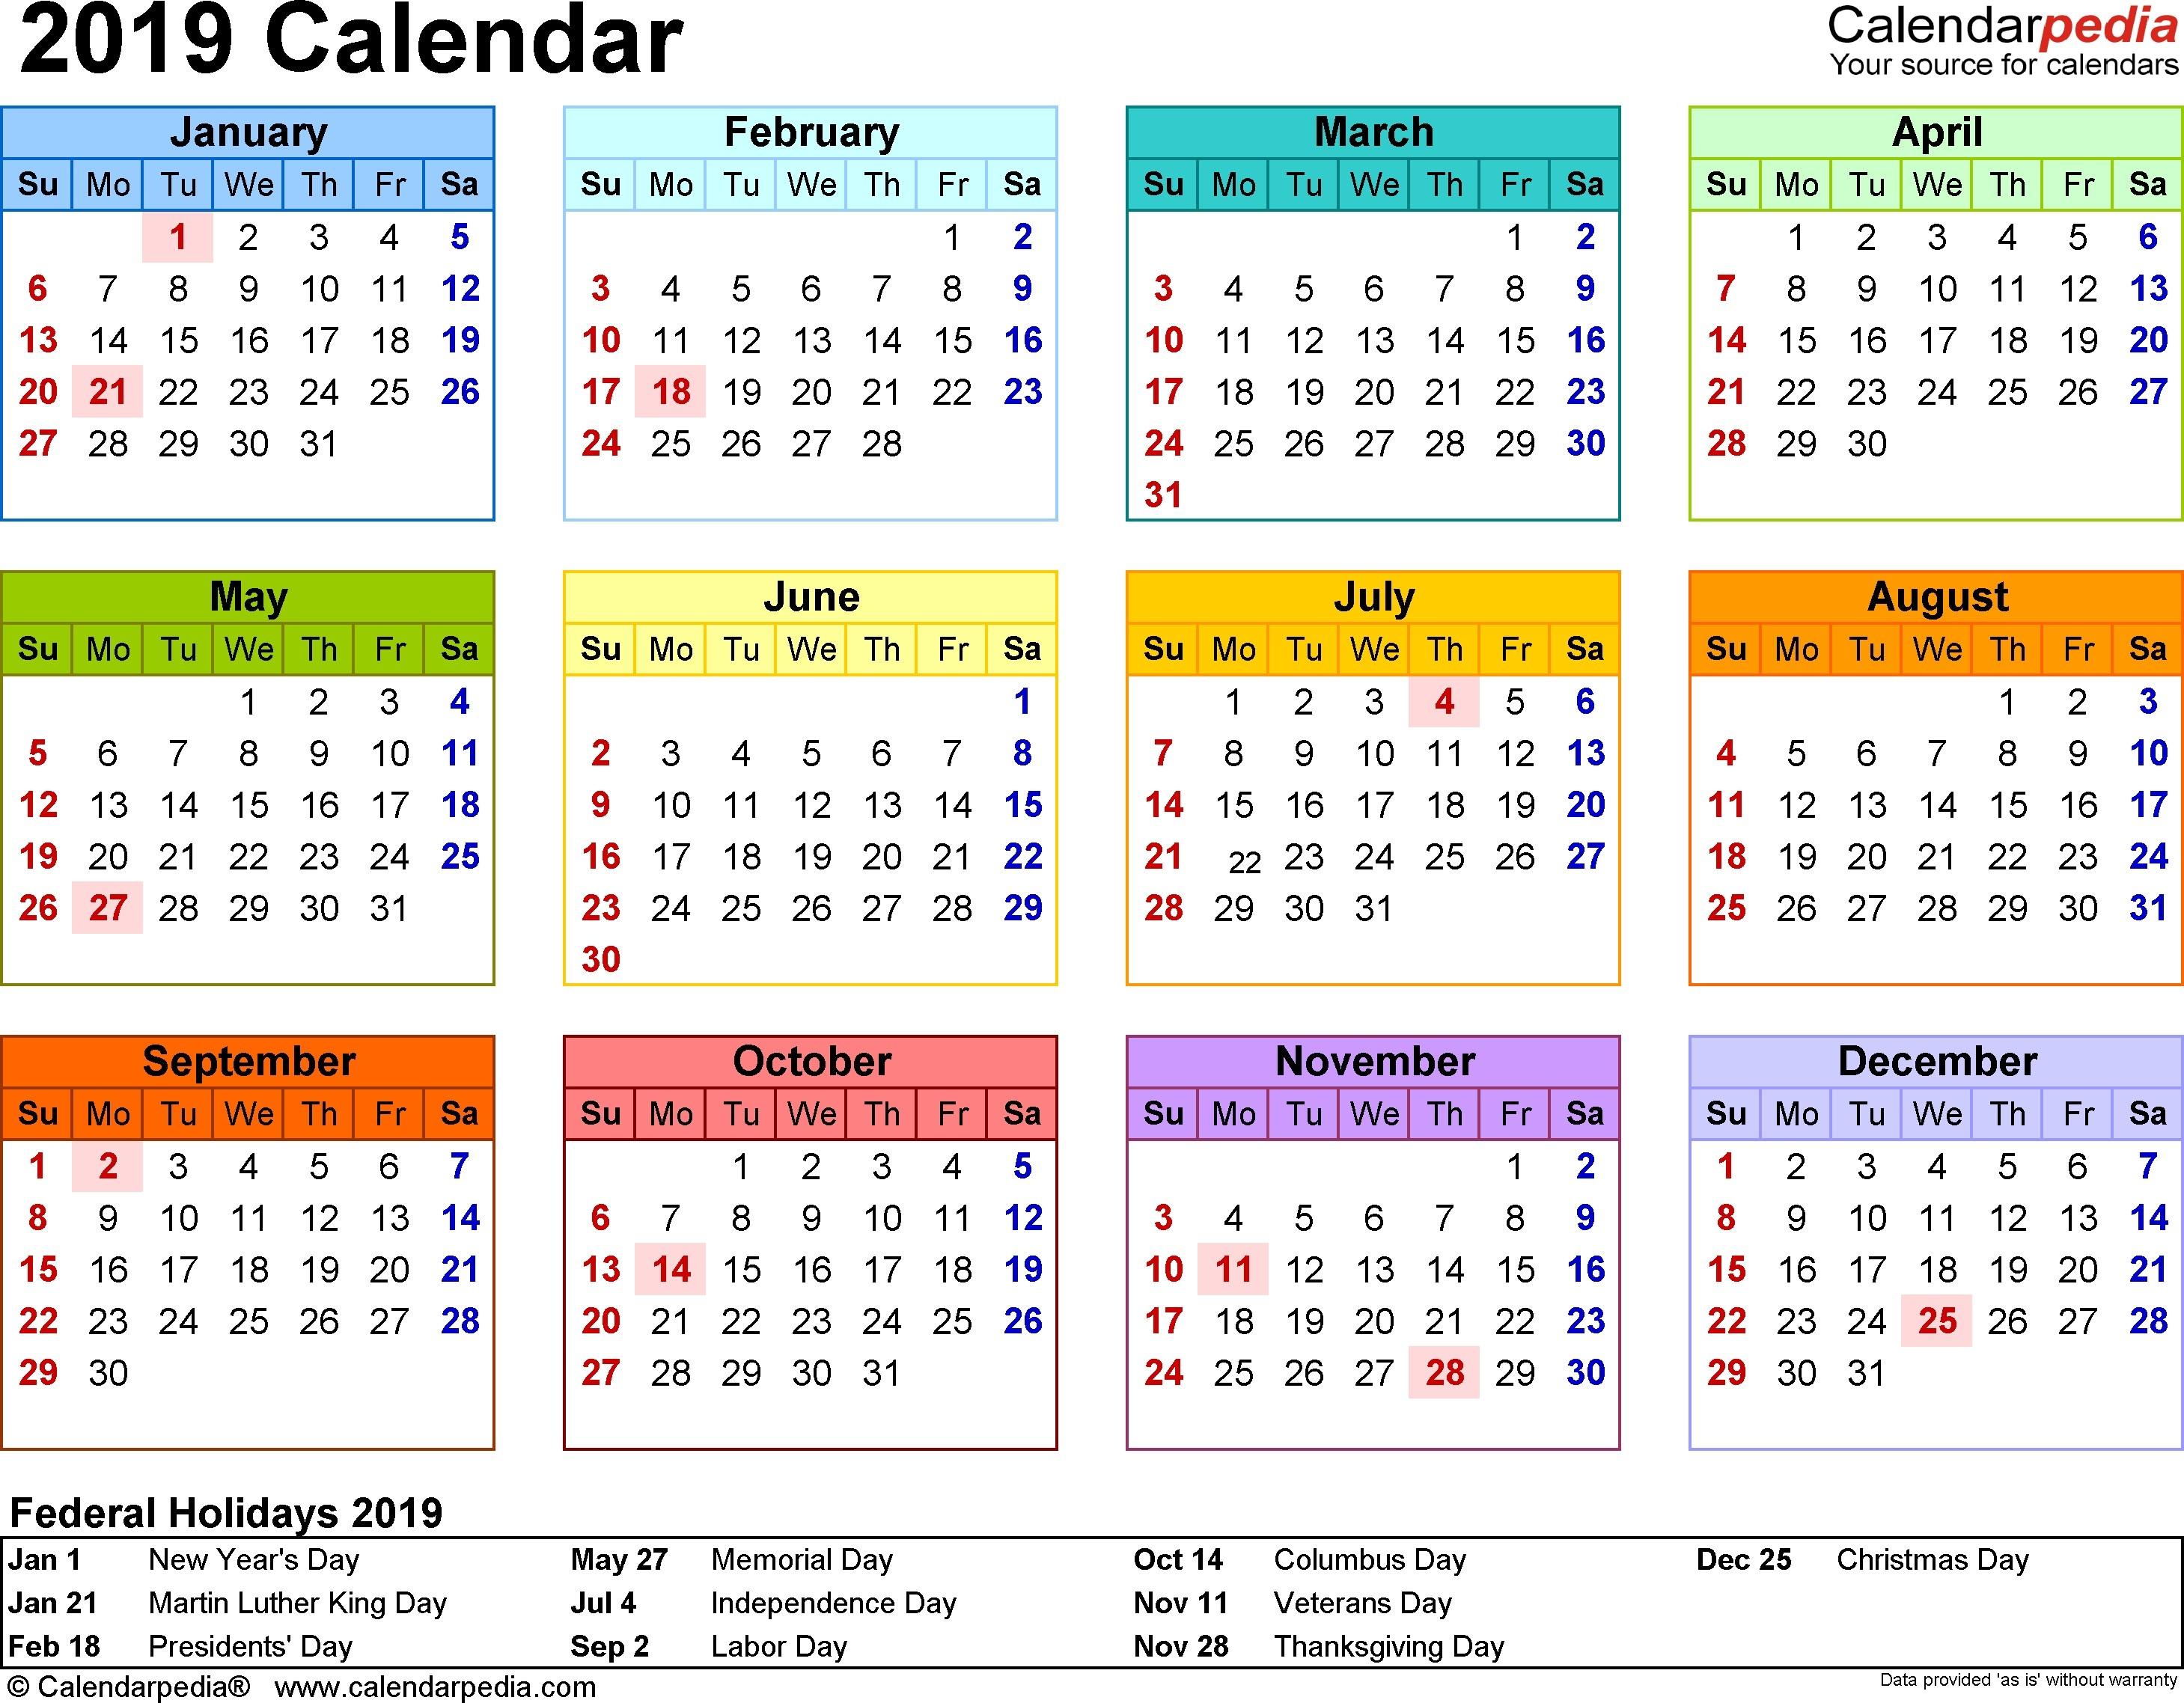 July 5Th 2019 Julian Date | Calendar Template  Julian Date For August 24